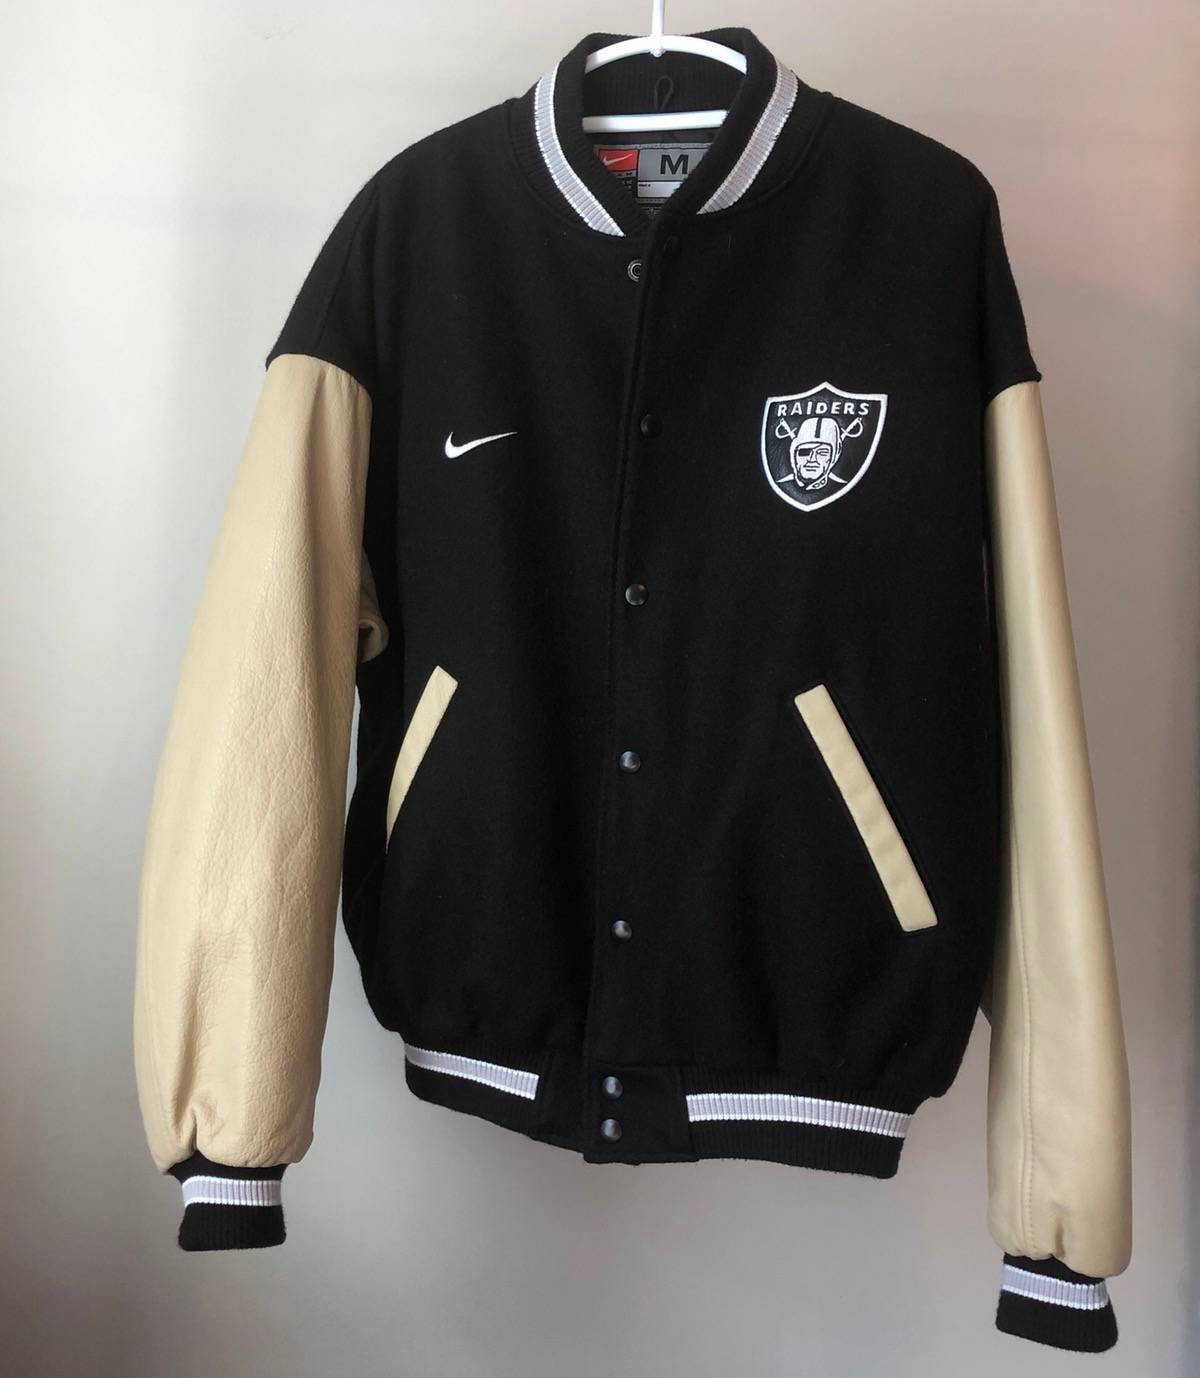 muestra ensayo alguna cosa  Nike Nike Oakland Raiders Jacket | Grailed